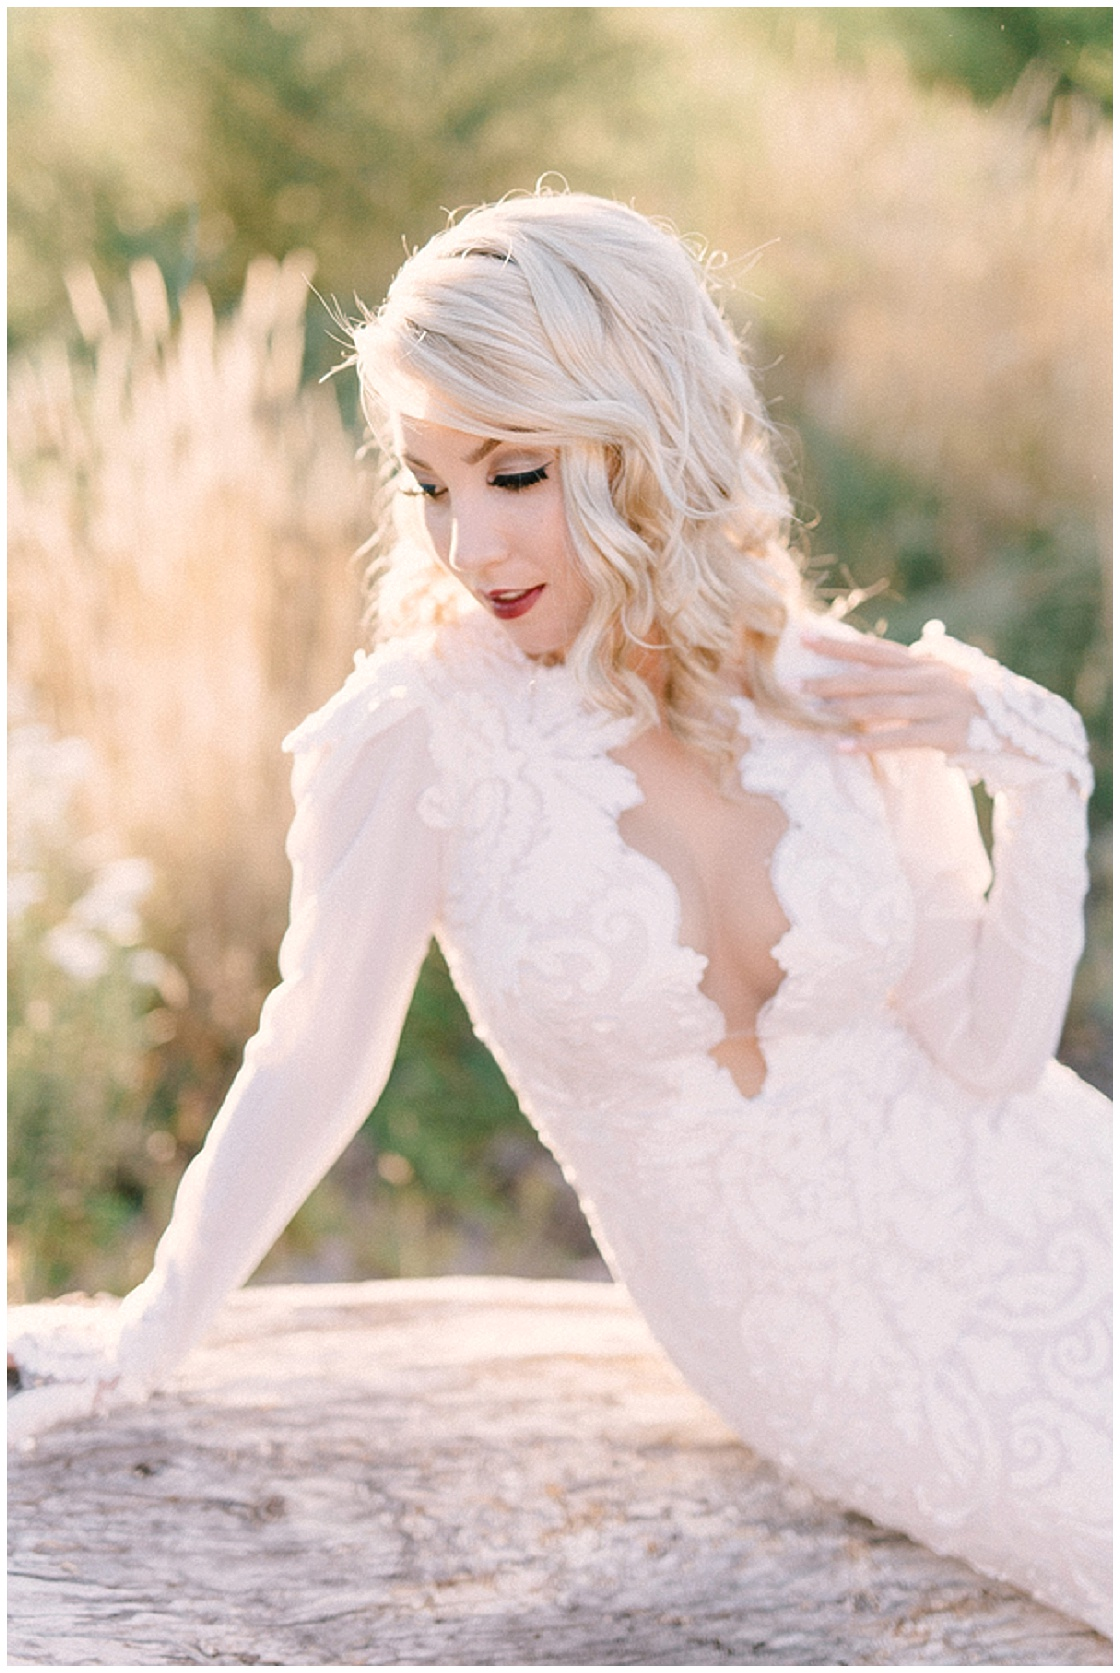 Intimate Elopement | Kate Becker Photography | Joy Wed blog | http://www.joy-wed.com